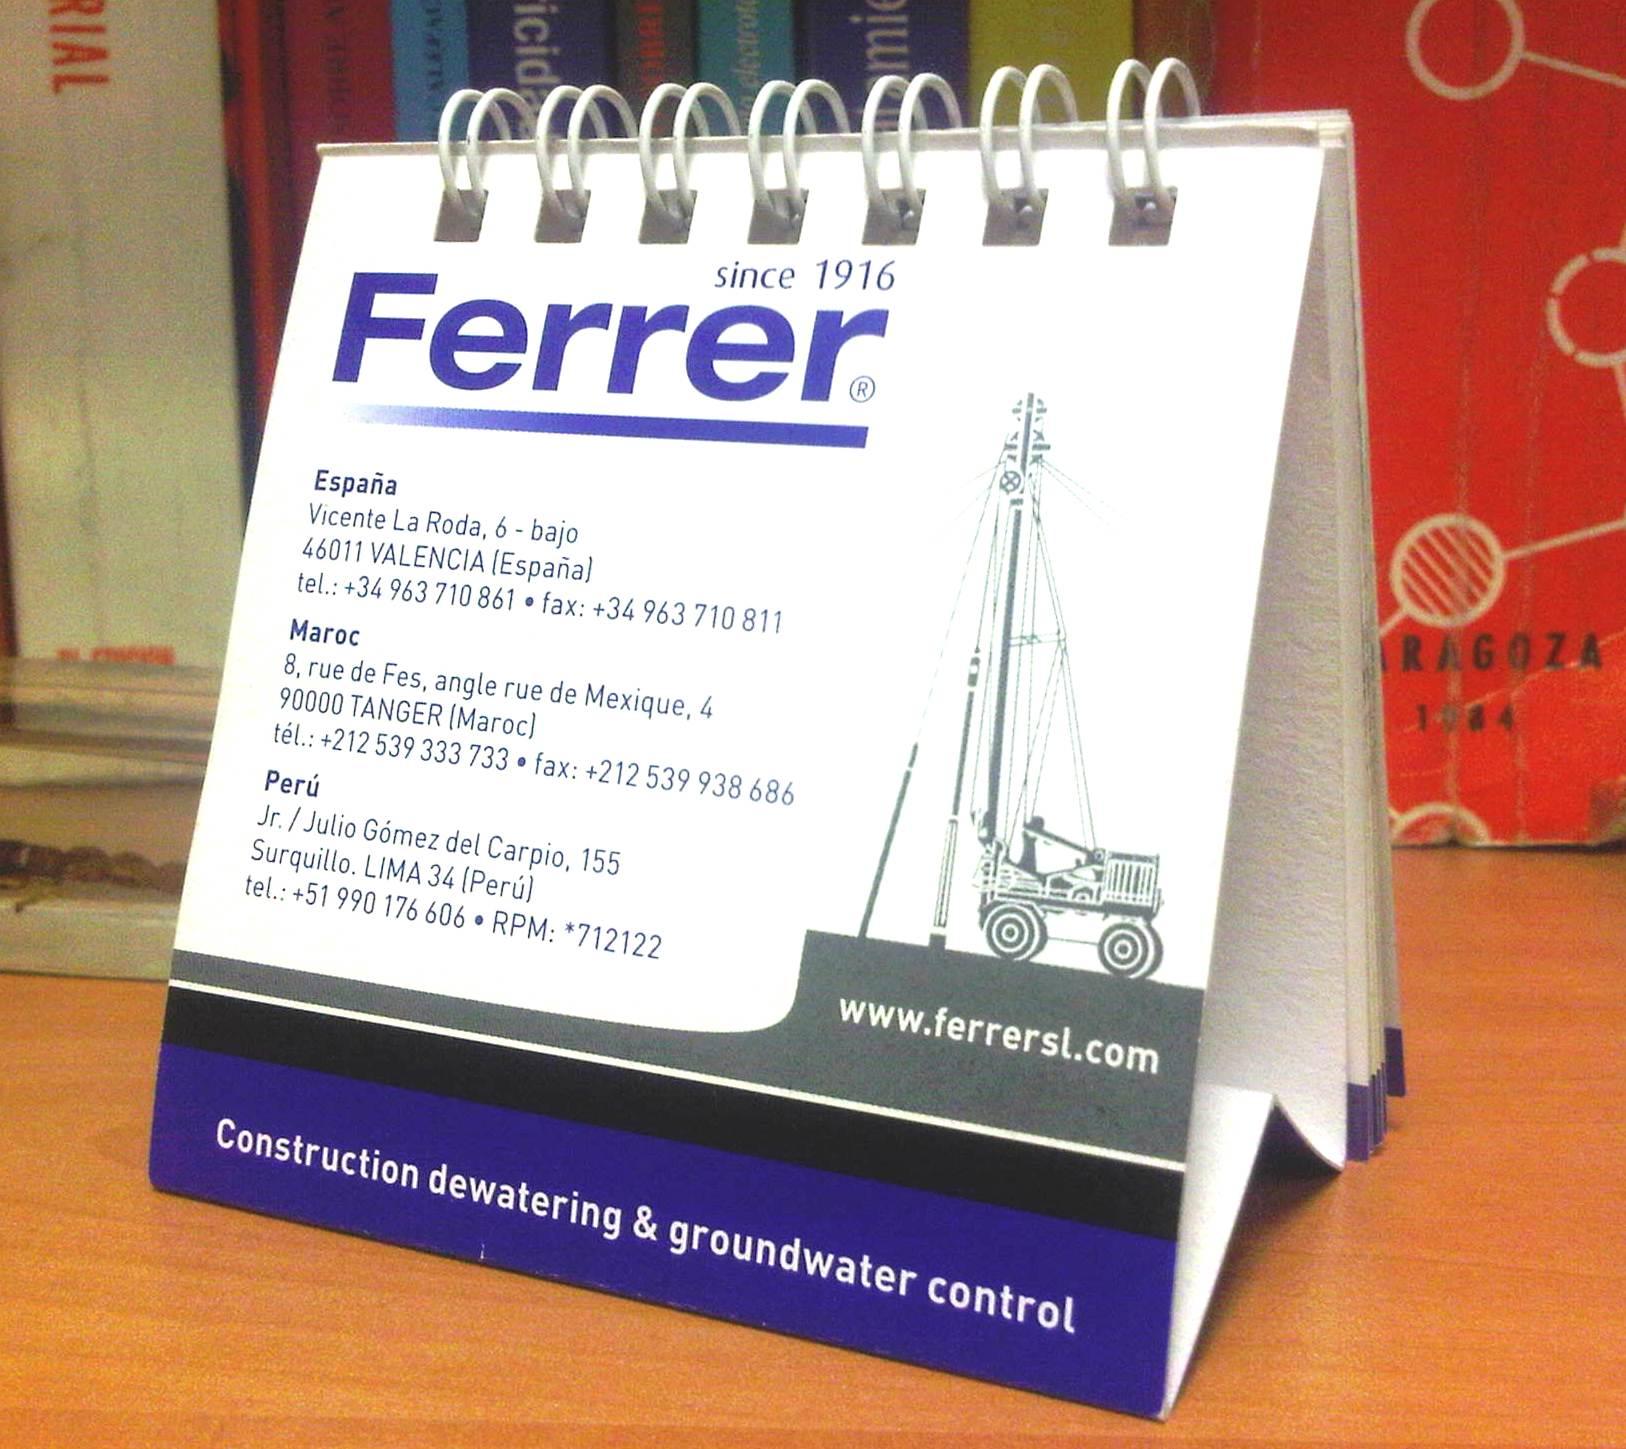 Calendario 2011 Espana.Calendario Ferrer 2011 Ferrer S L